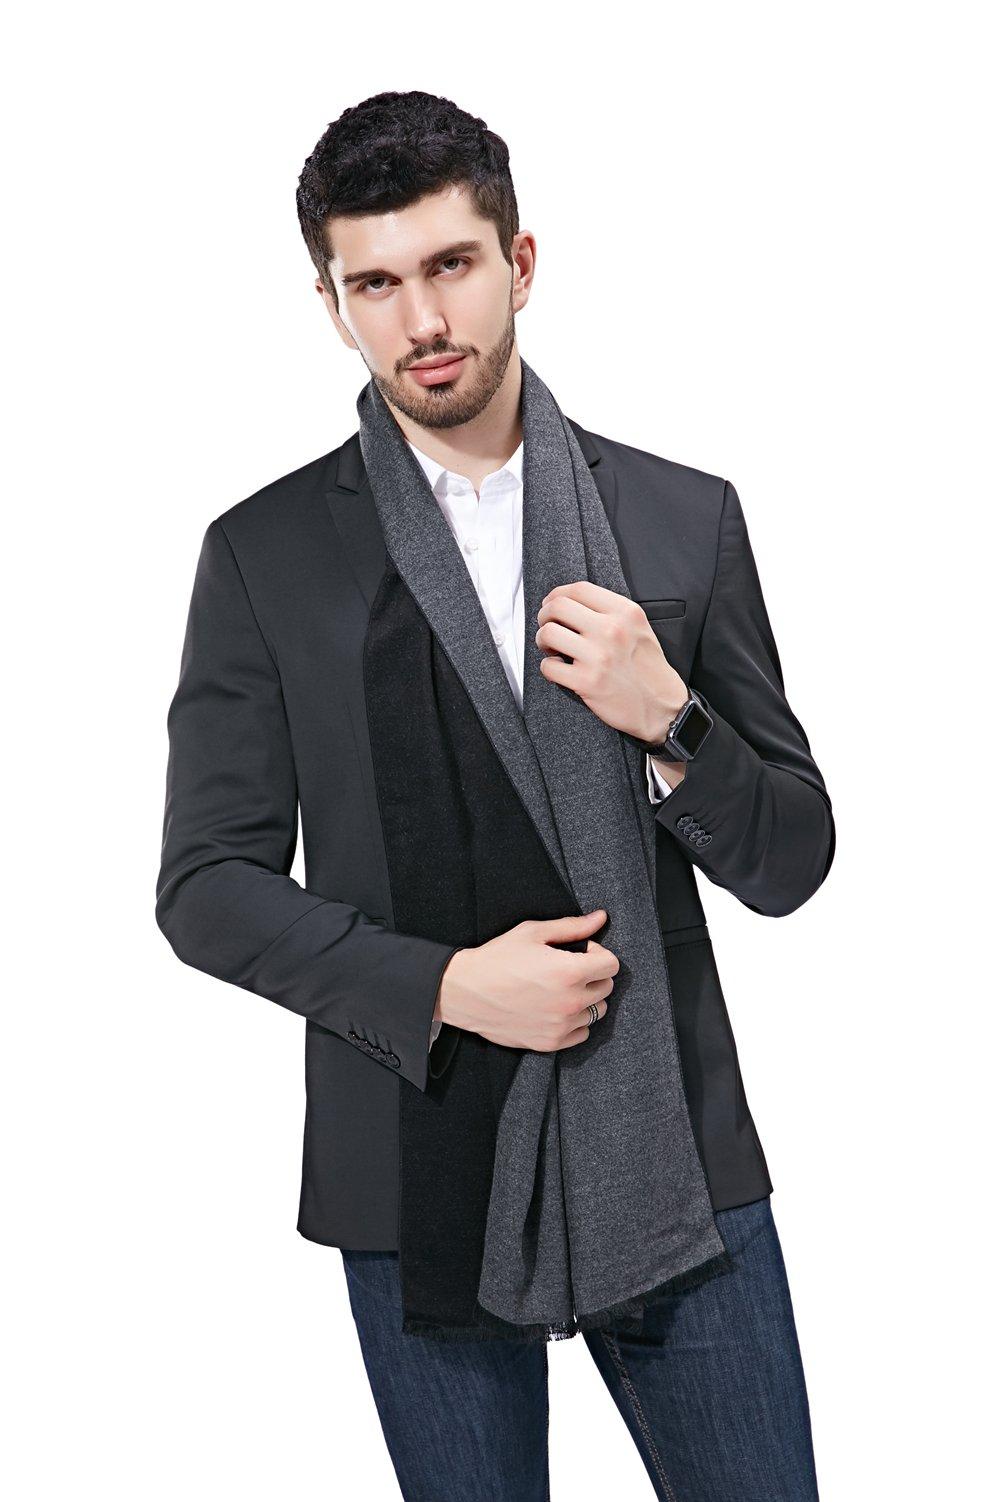 FULLRON Men Cashmere Scarf Cotton Scarves - Reversible Design, Black&Gray